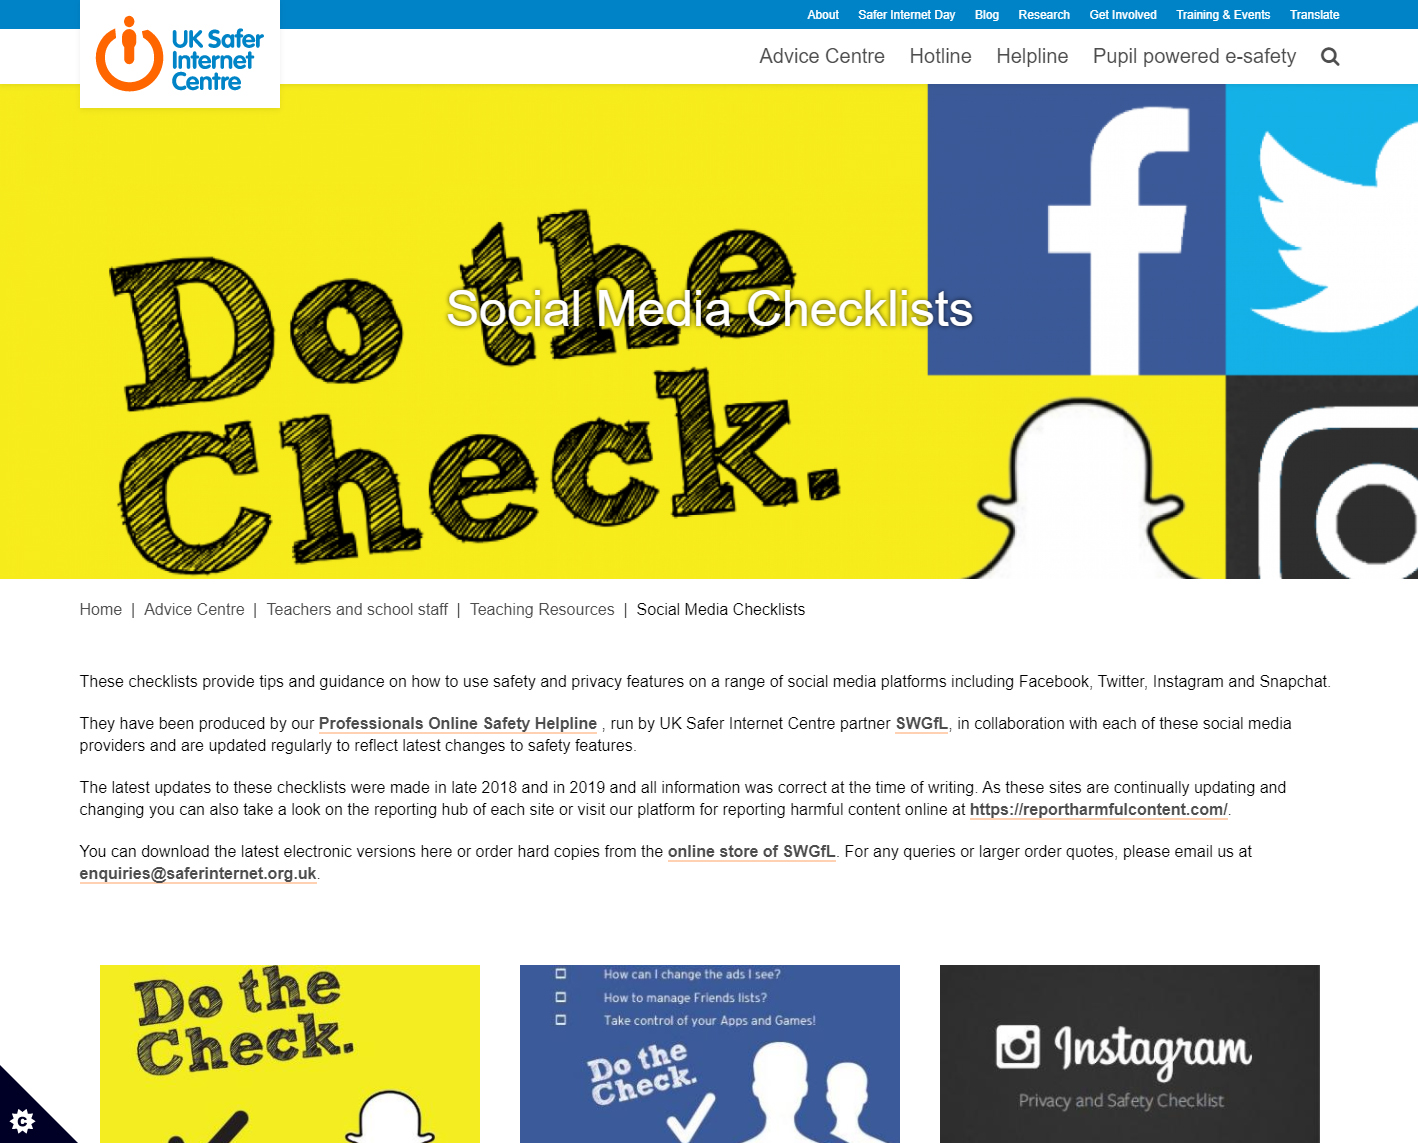 UK Safer Internet Centre Social Media Checklists